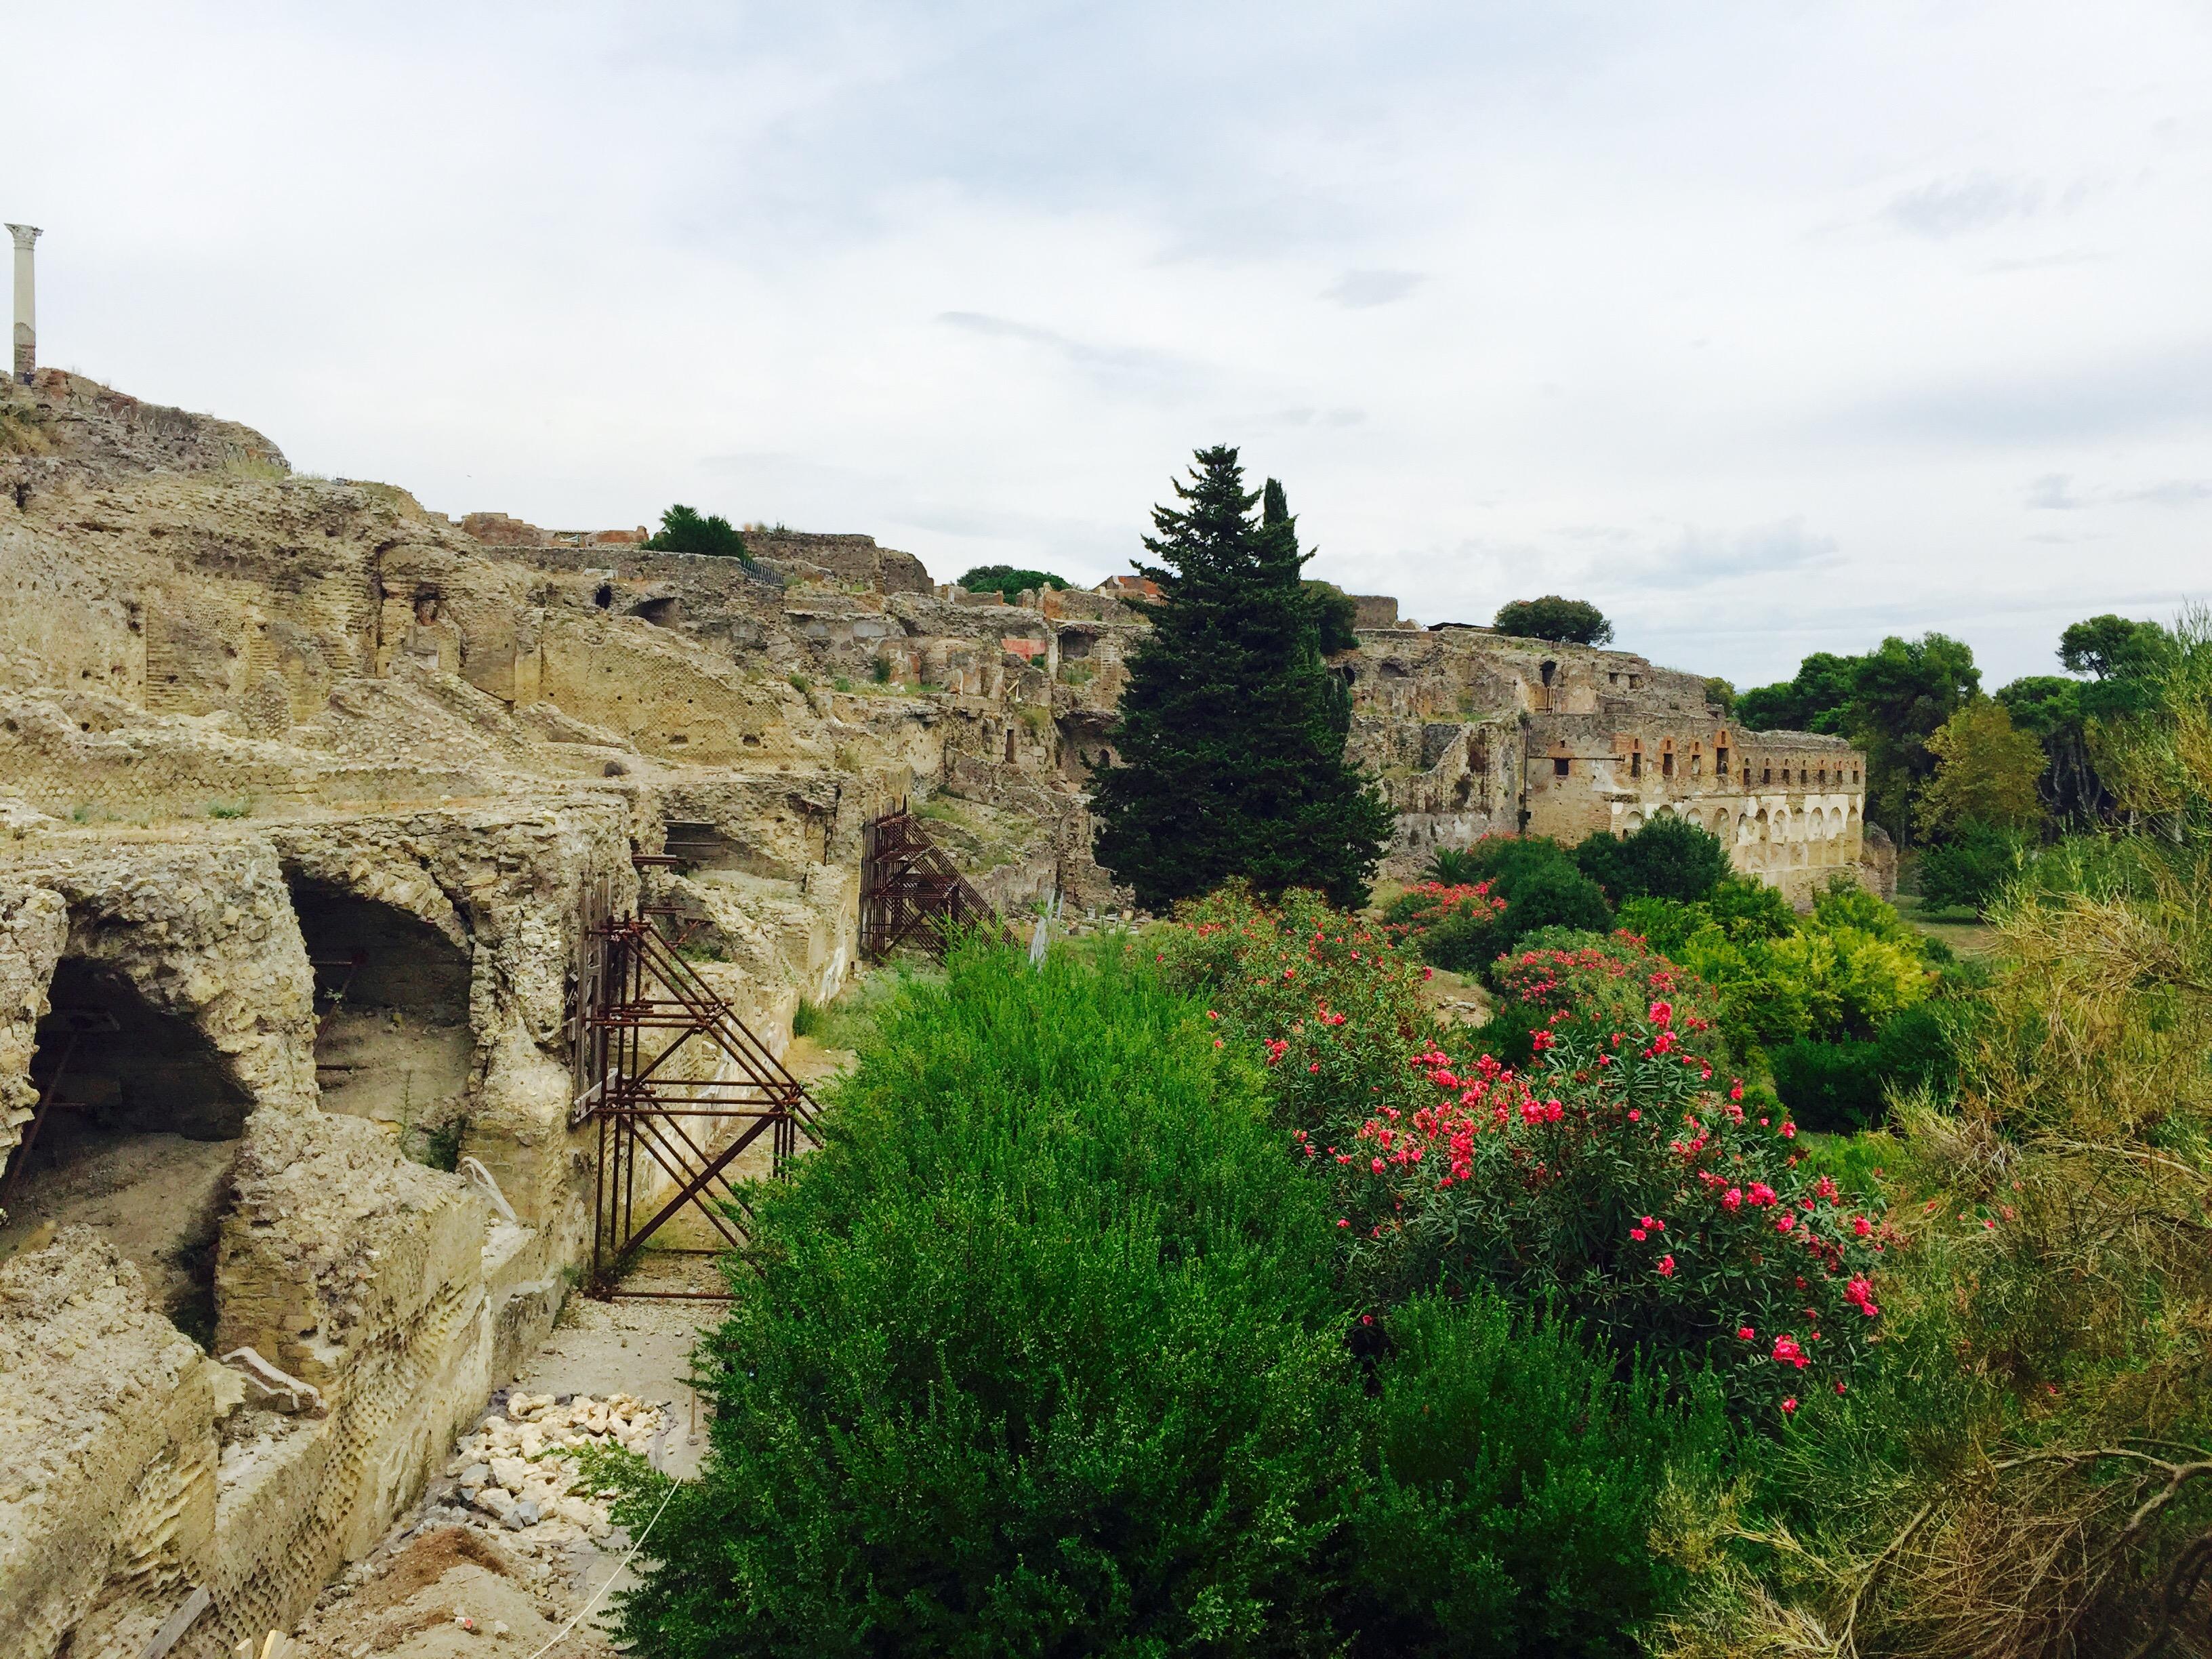 Pompeii, Province of Naples, Campania, Italy